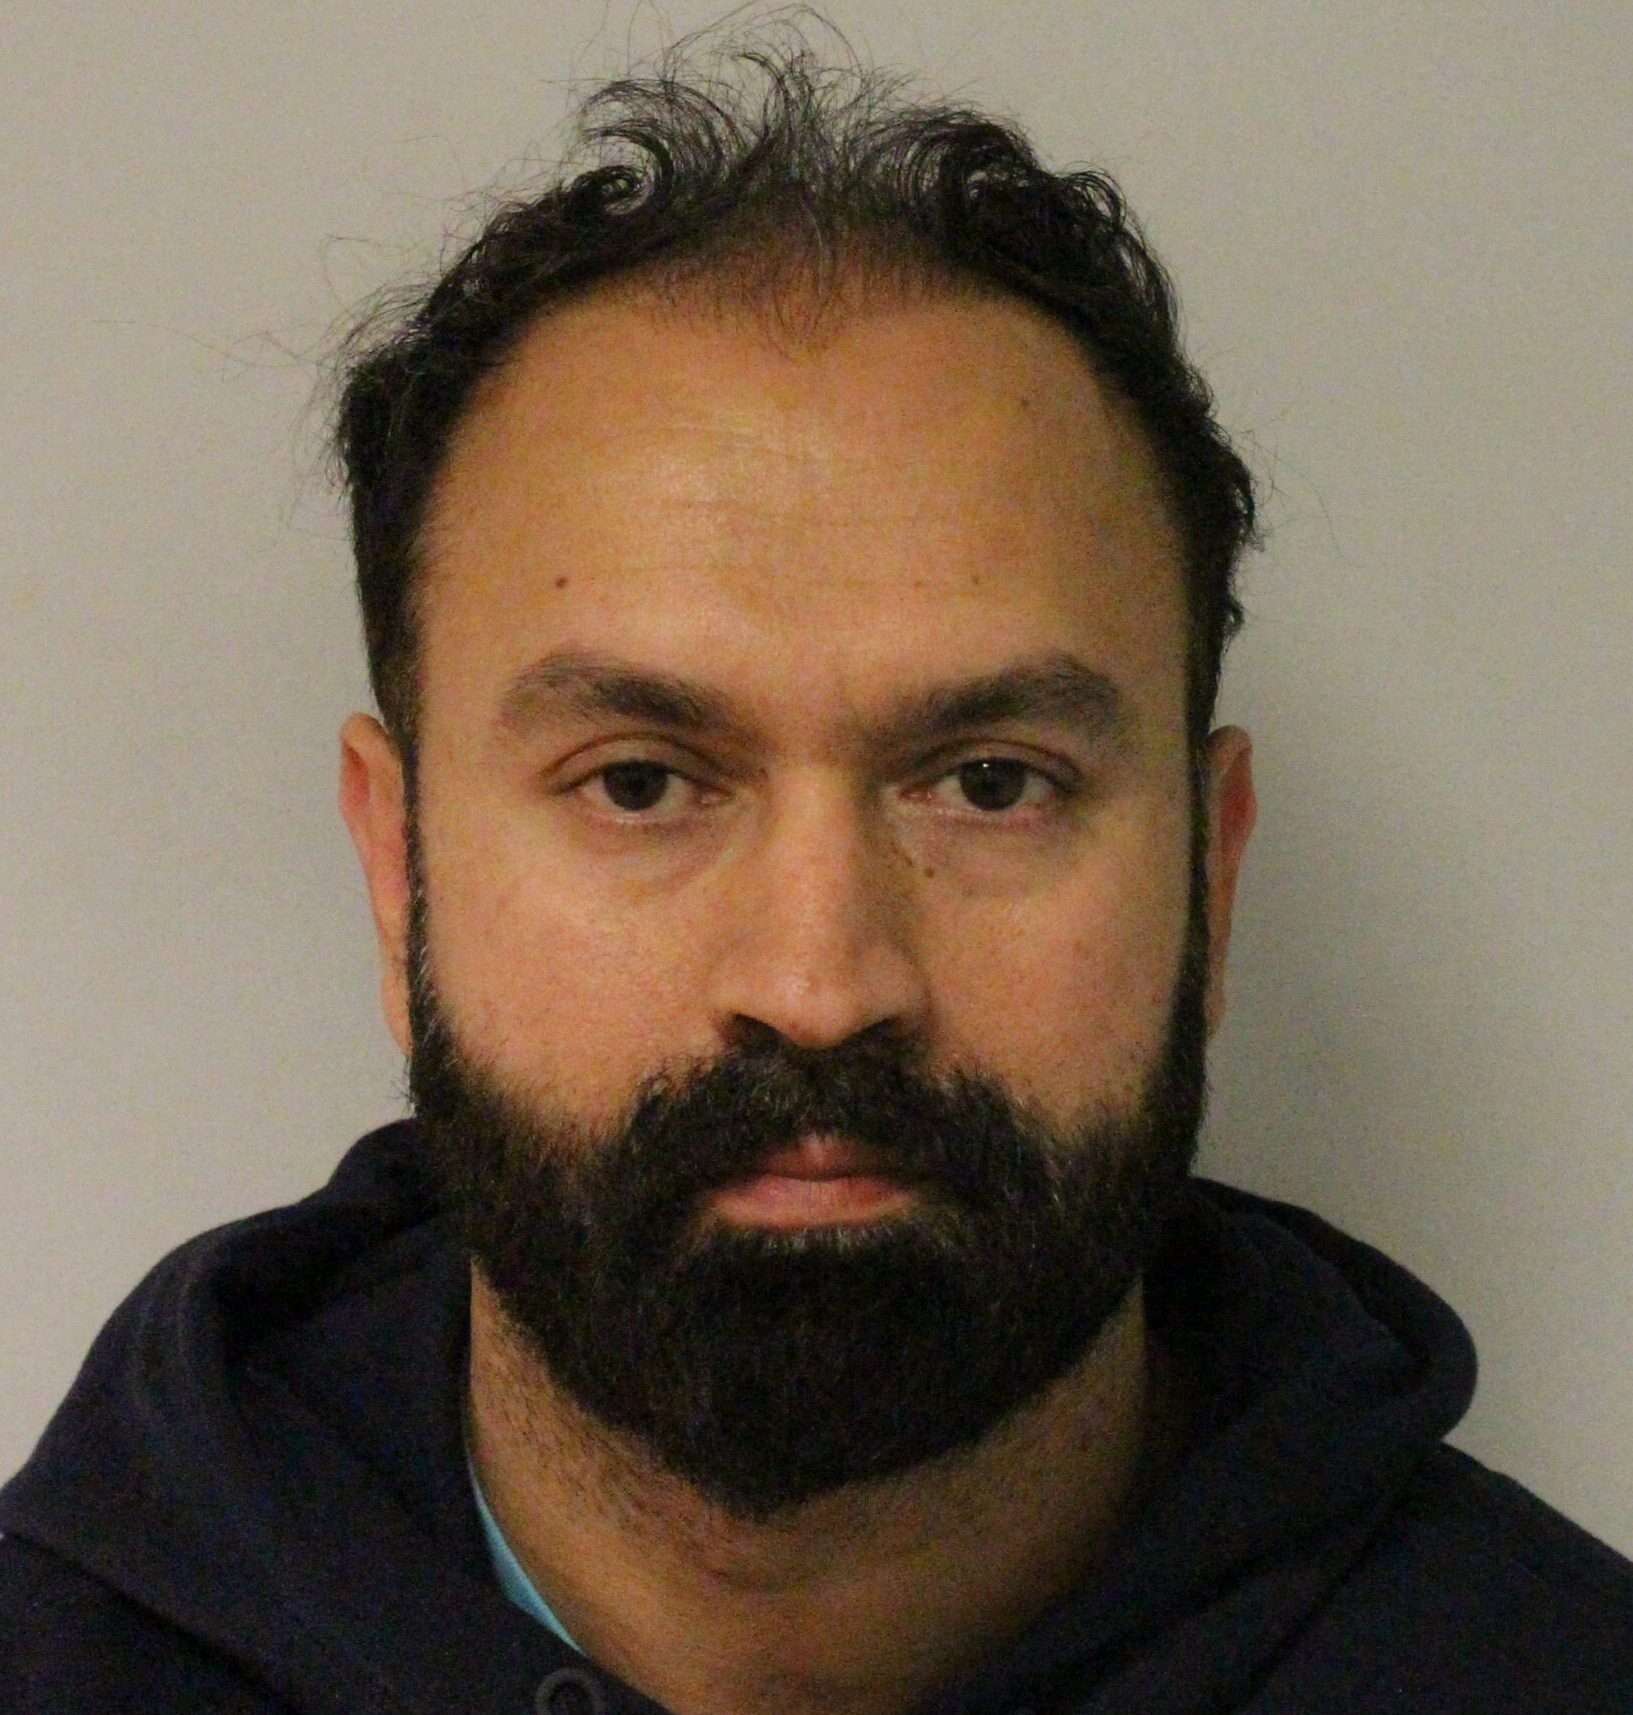 Creepy cop spared jail